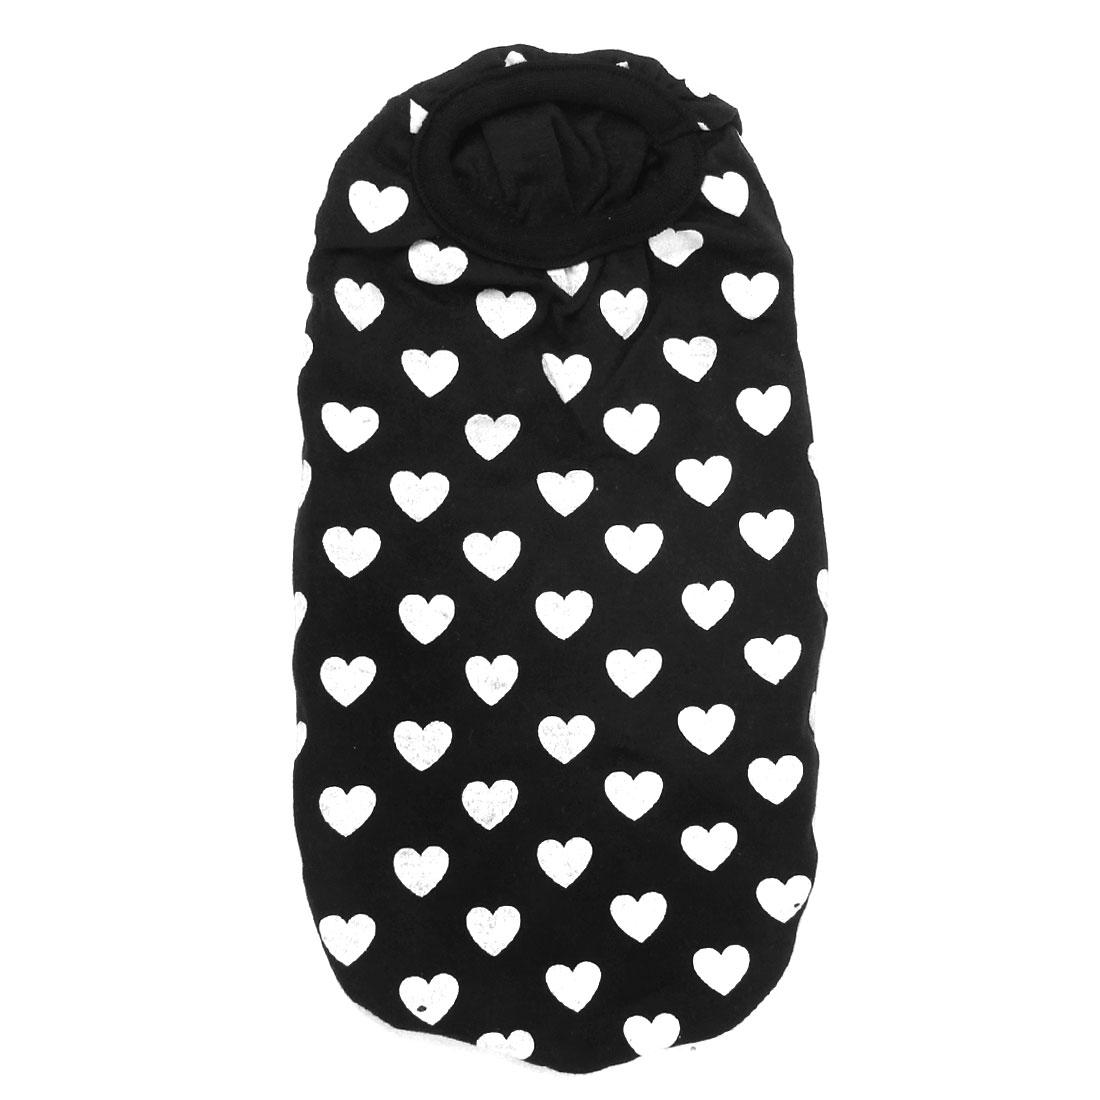 Heart Print Sleeveless Summer Pet Dog Doggy Tank Top Tee Shirt Black White Size XS